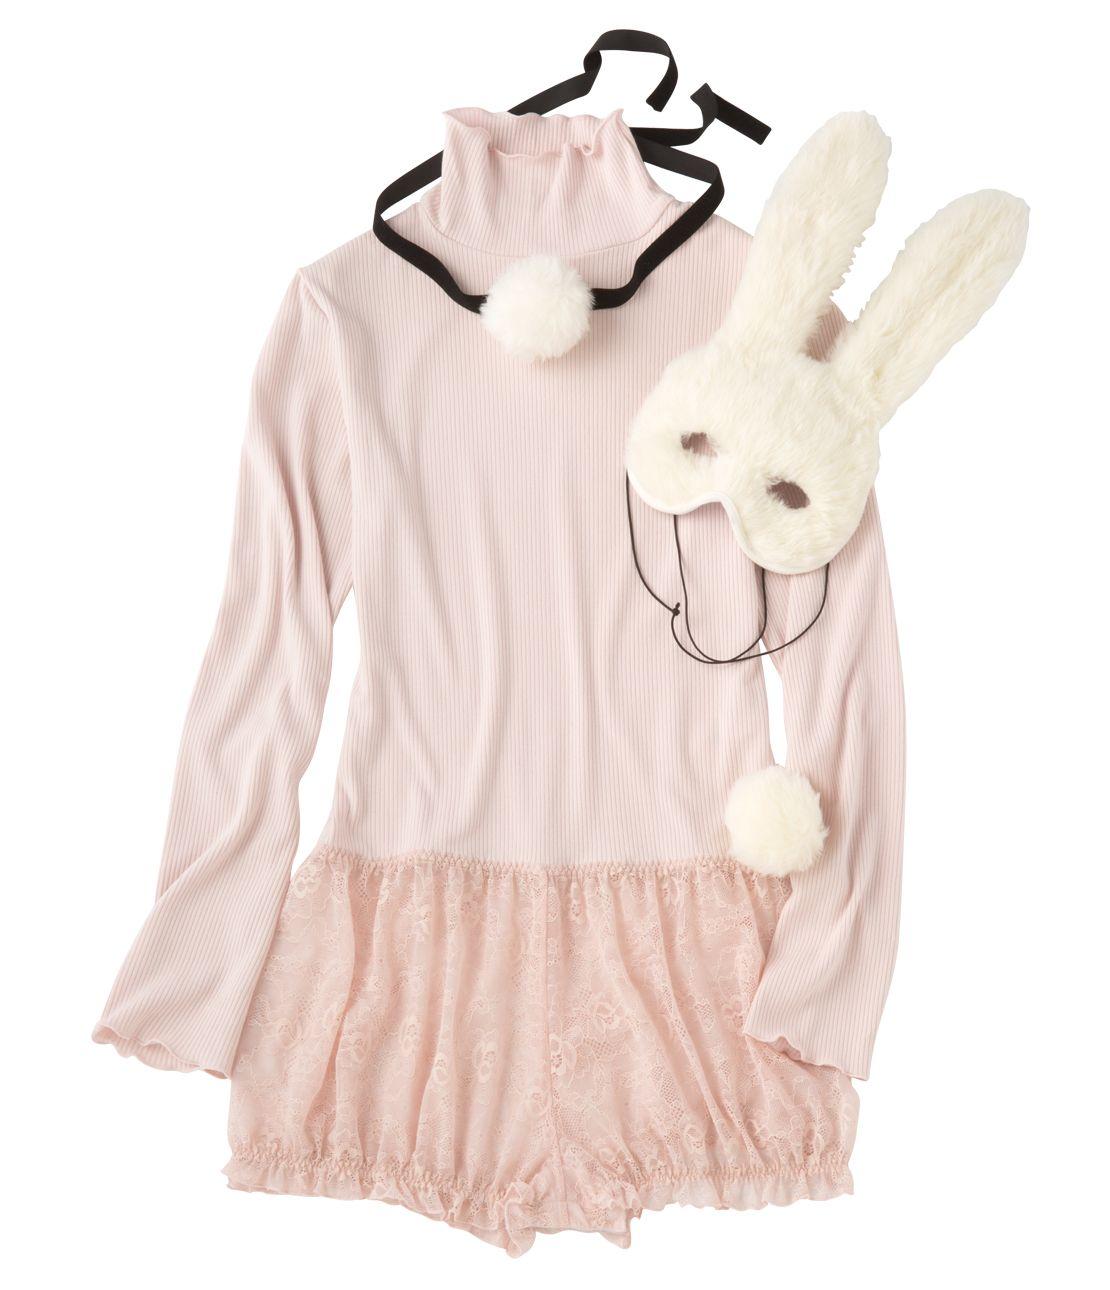 YM我的兔子身上設置